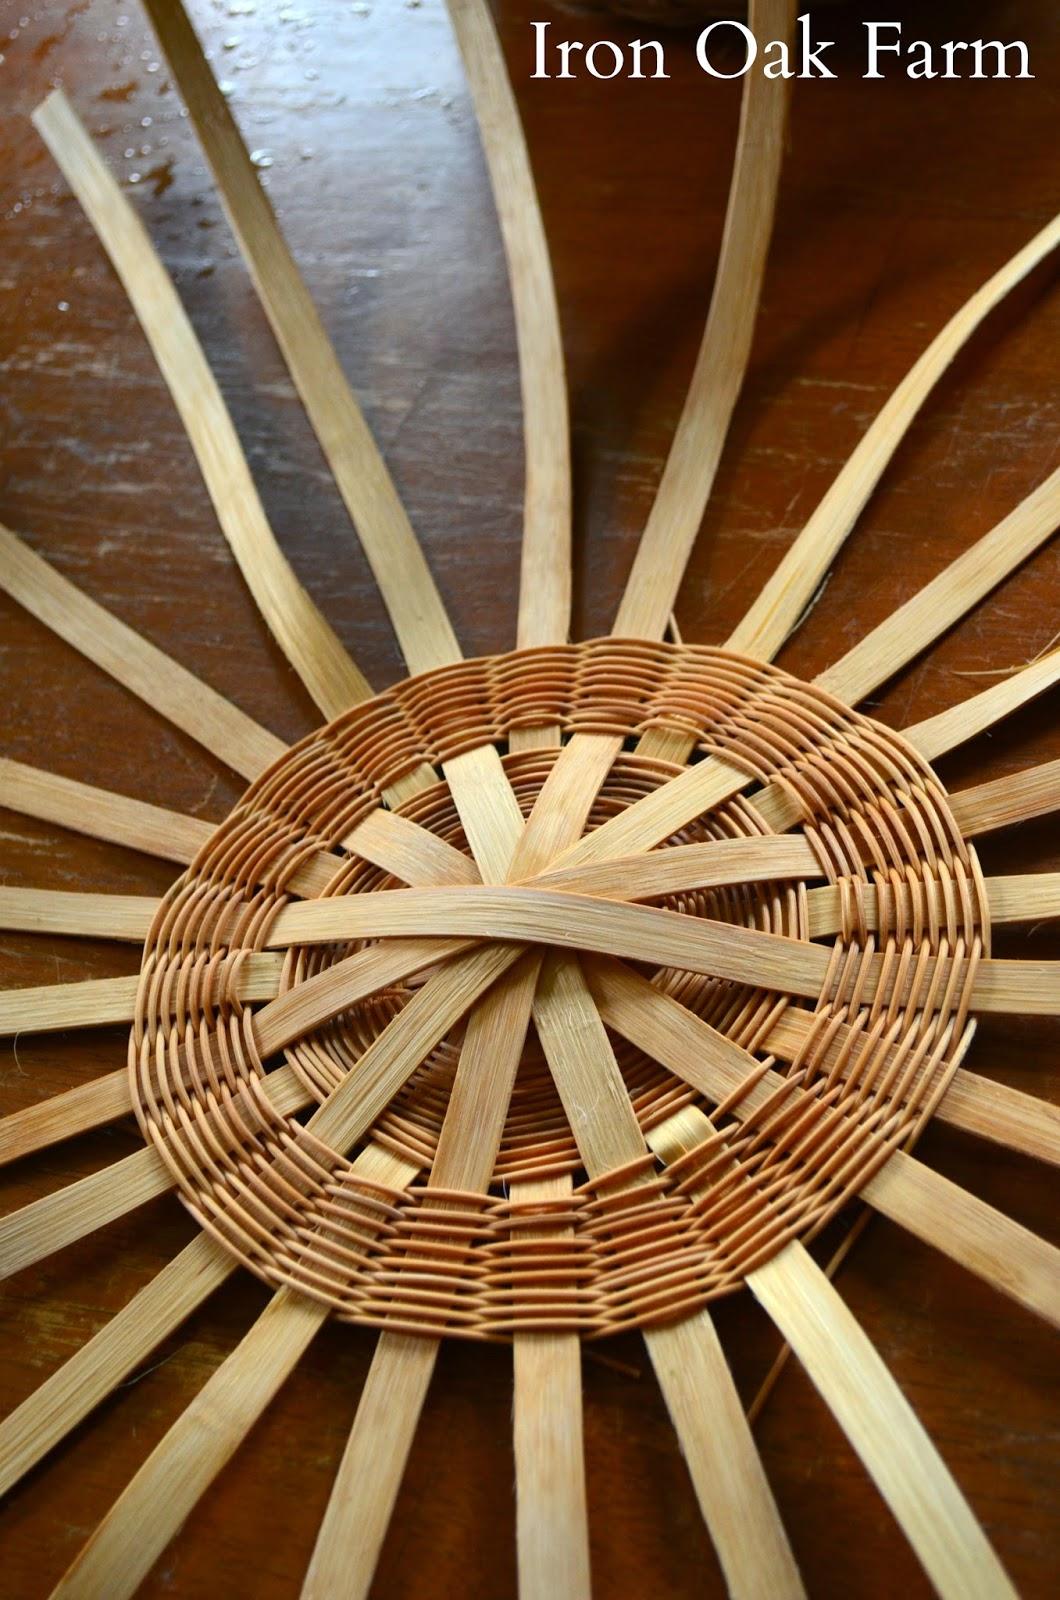 Basket Weaving Round Reed : Iron oak farm round bottom basket